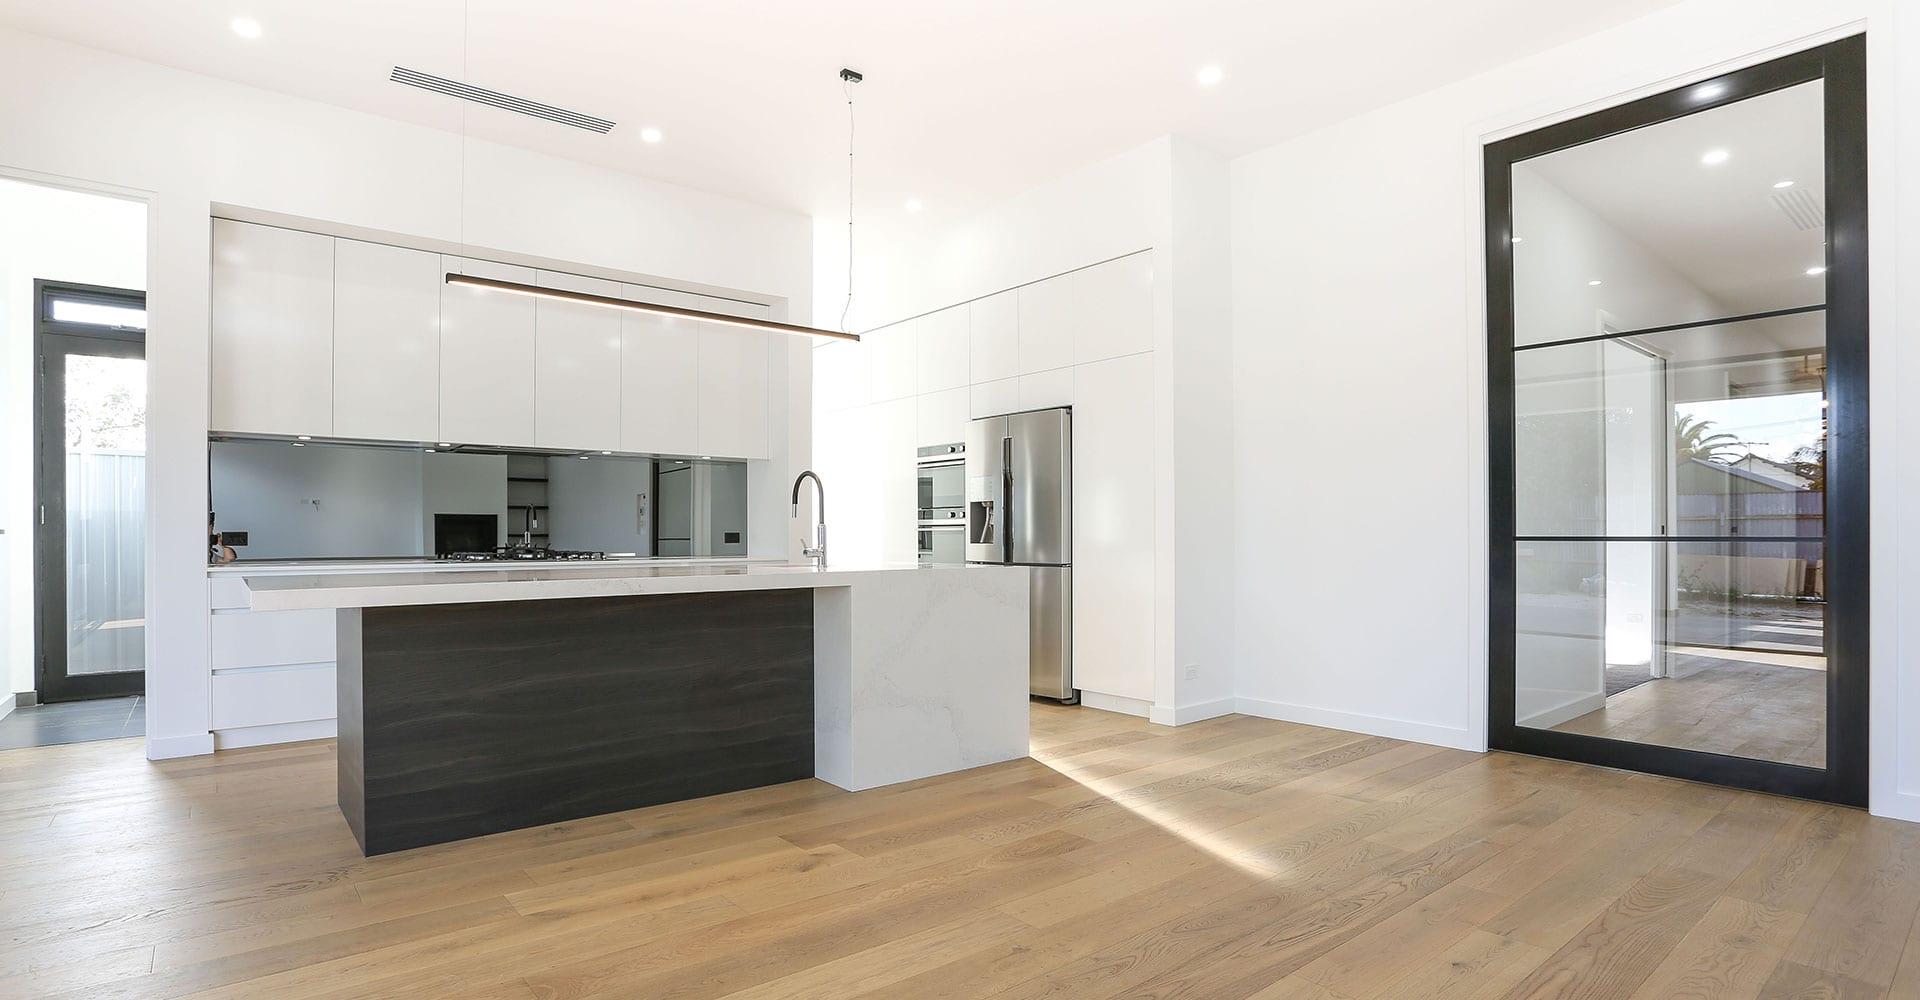 In Property design Project Development